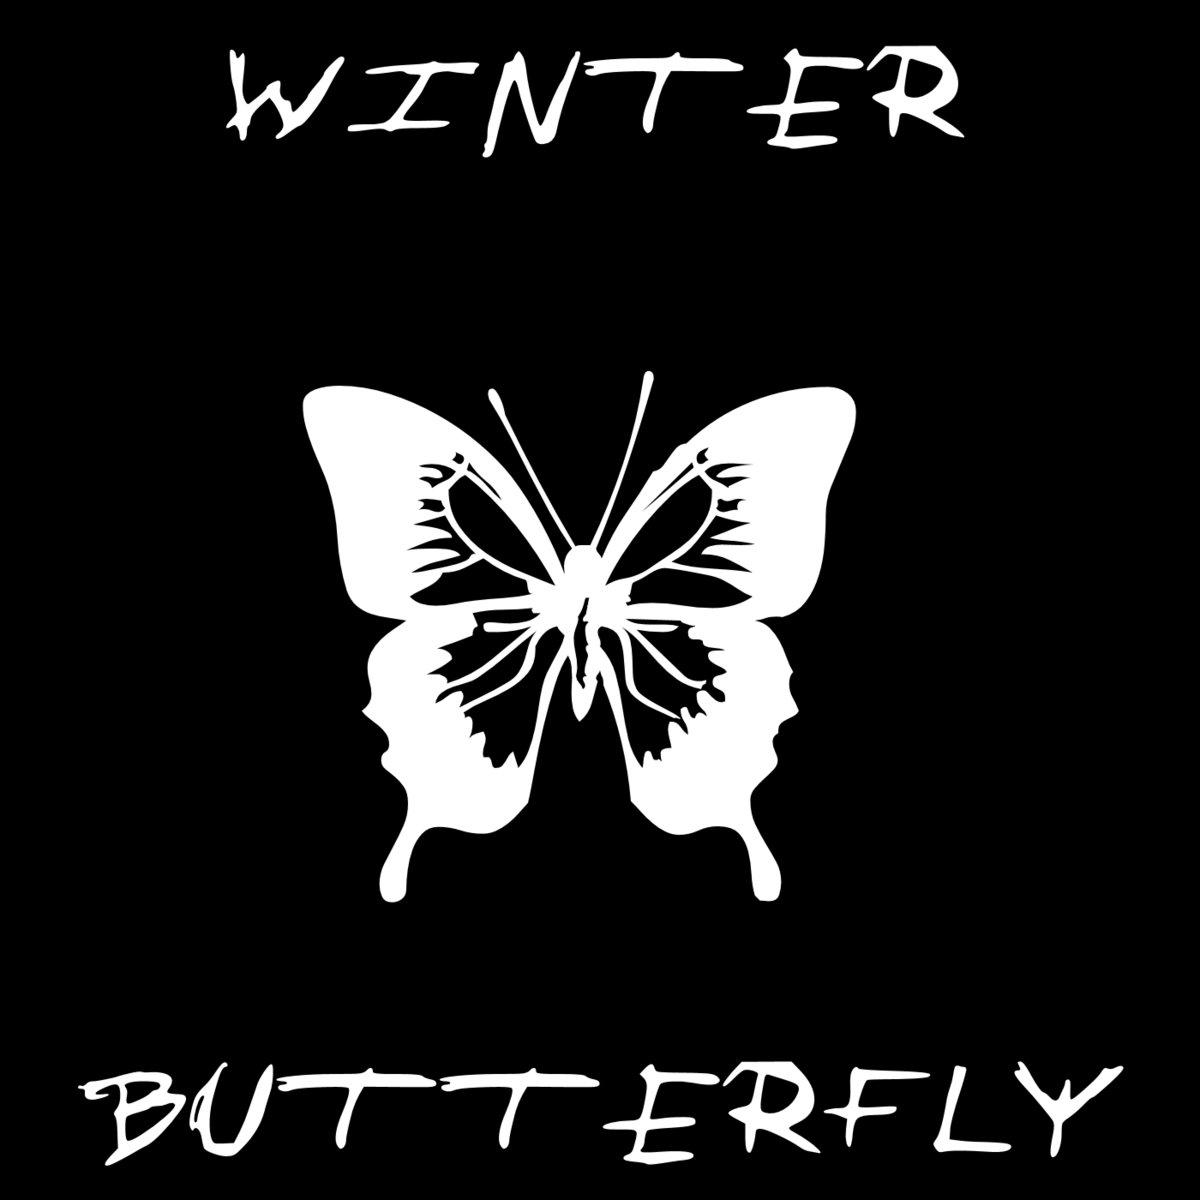 Winter Butterfly (Remaster) (album)